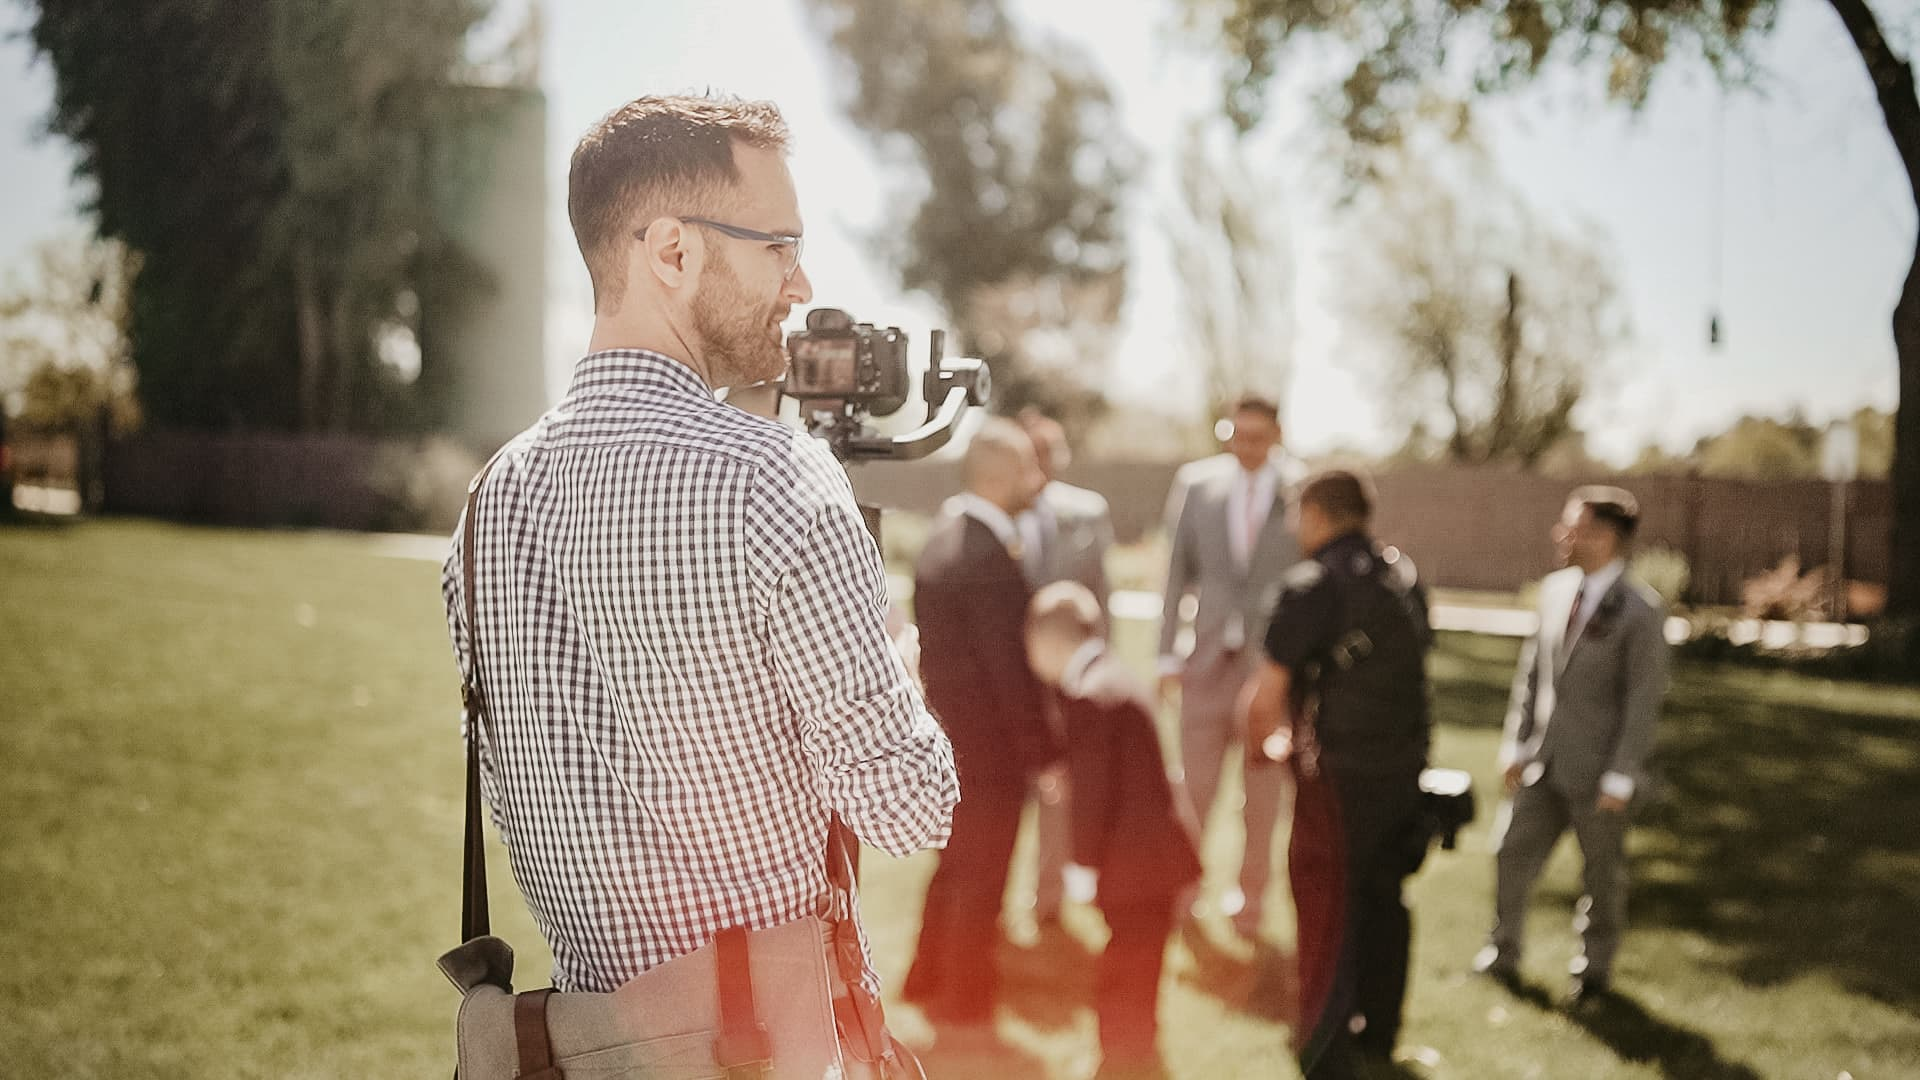 wedding videographer second shooter